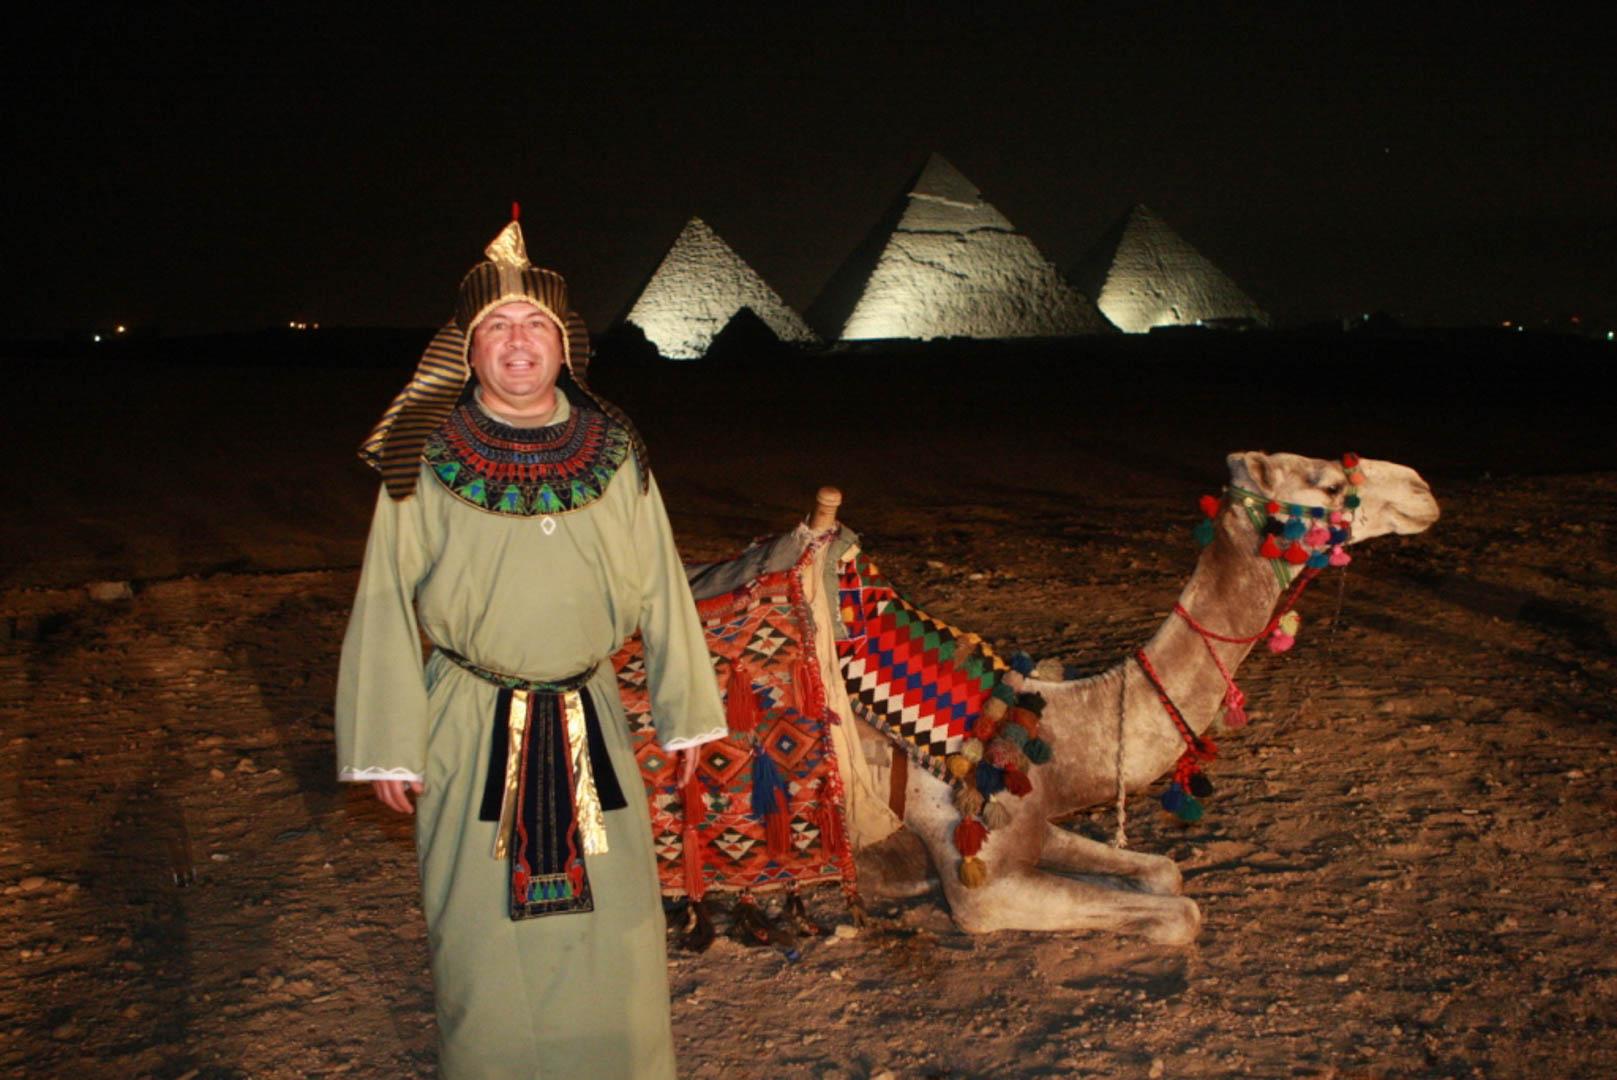 Raoucha Kandahar- Oriental Tents - 360 Solutions (30).jpg